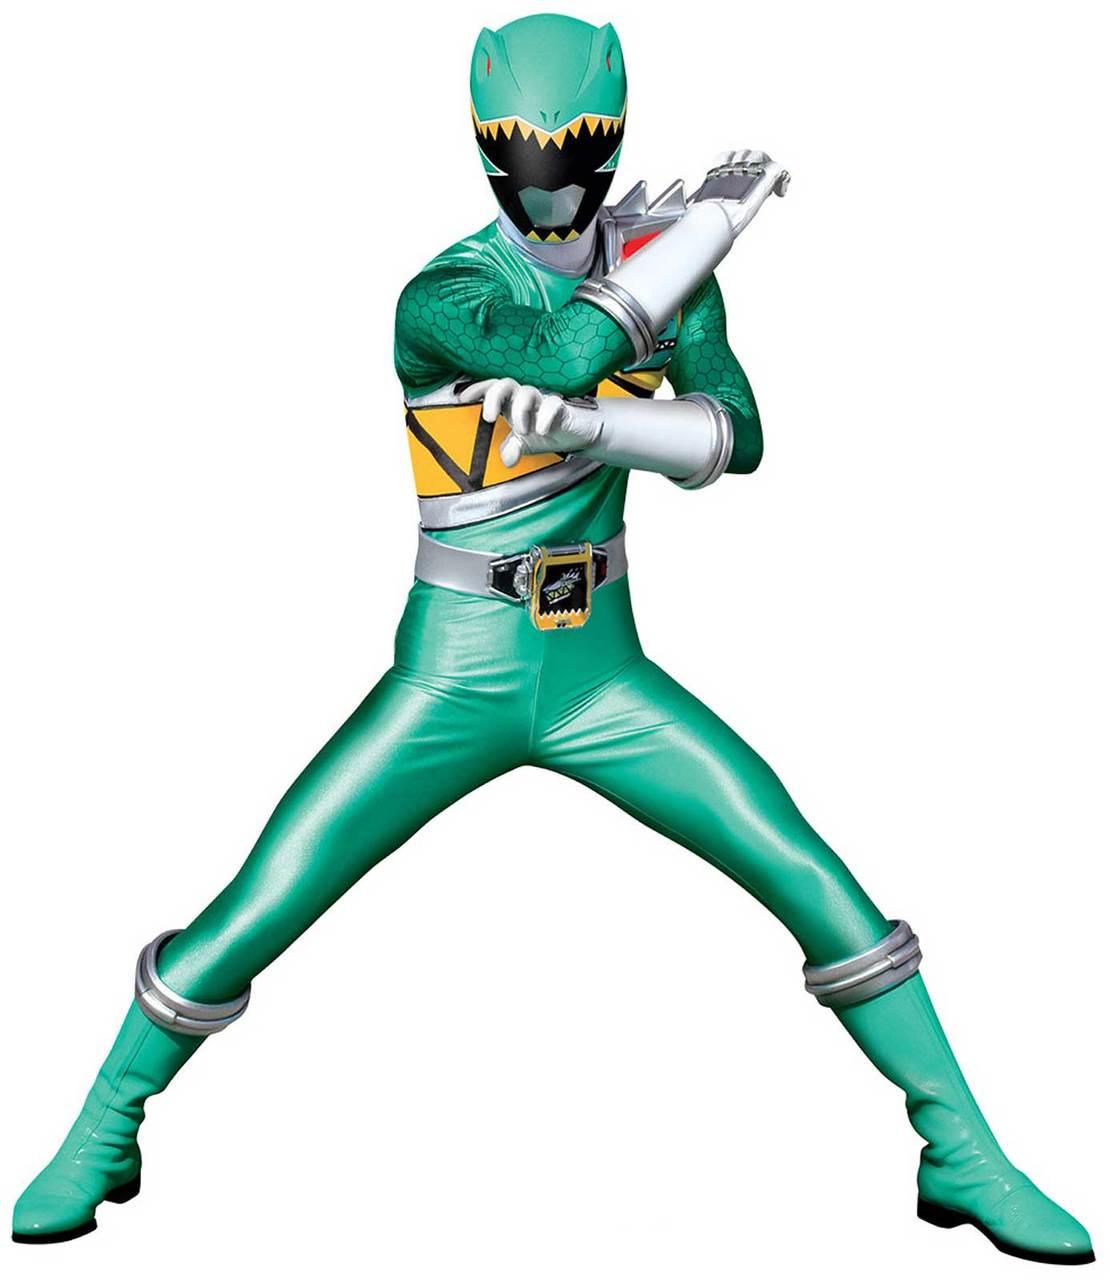 Power Rangers Dino Charge Green Ranger Standup - 5' Tall